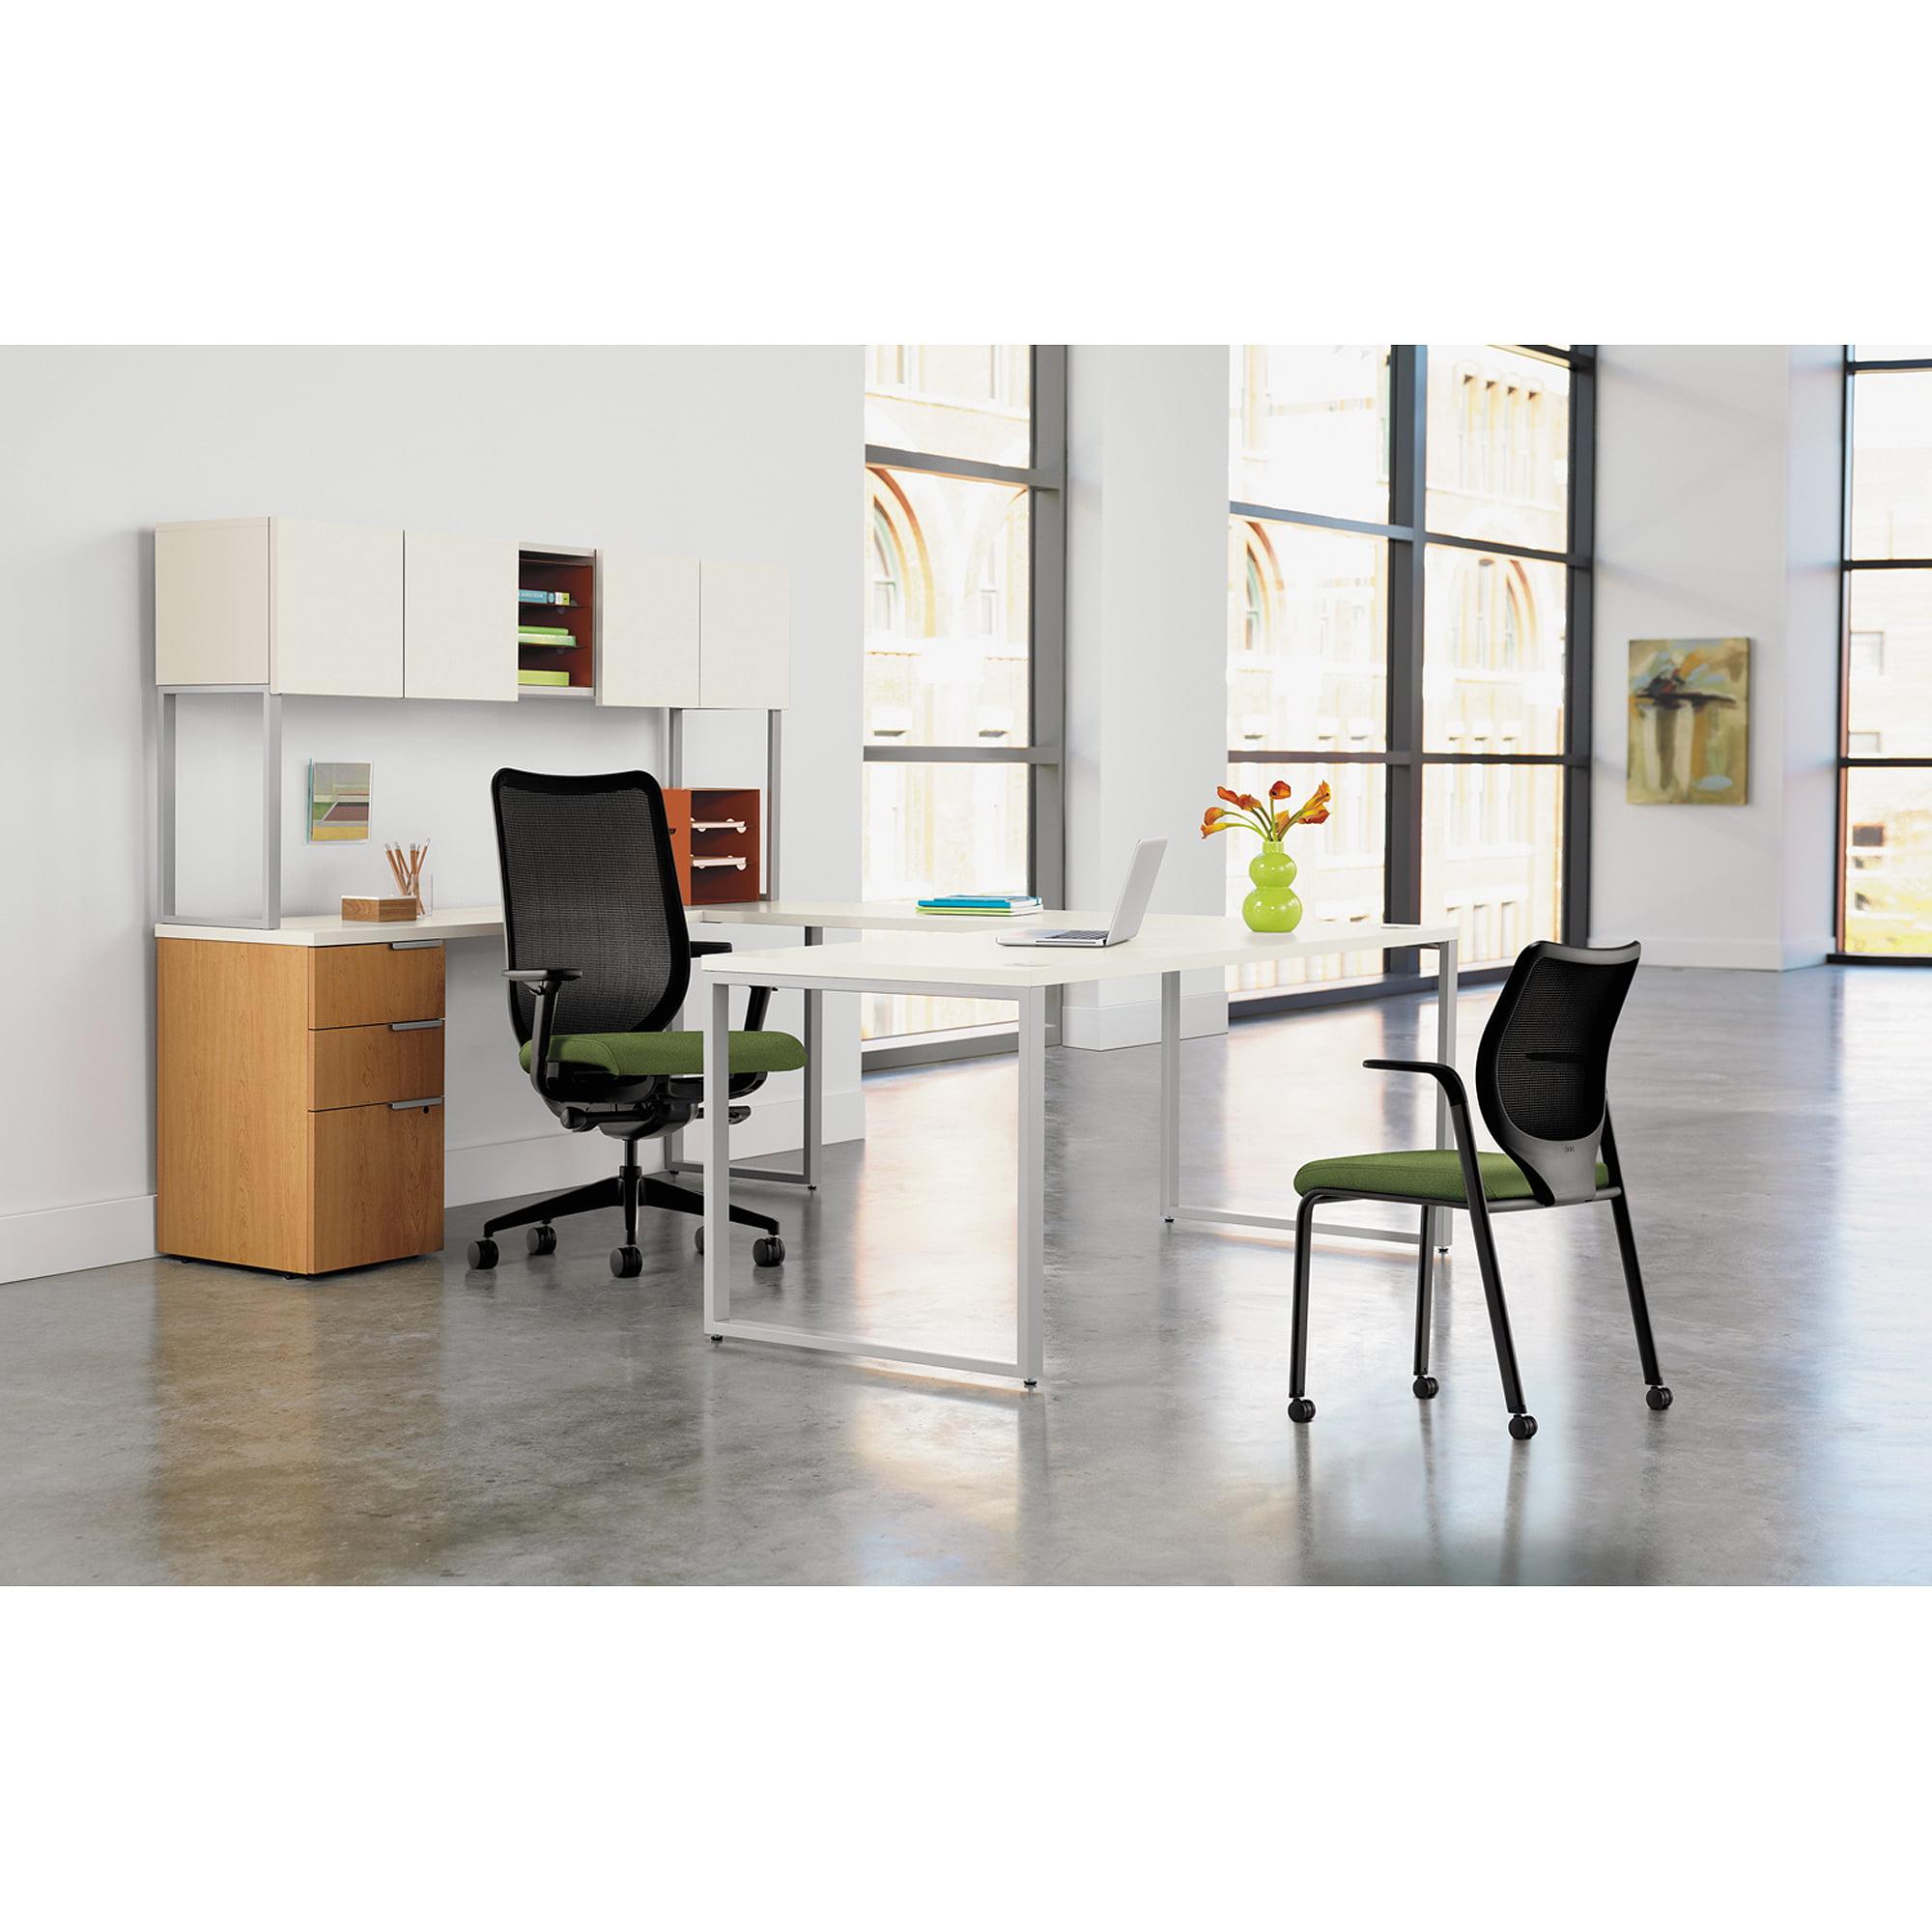 Hon Nucleus Series Multipurpose Chair, Black Ilira-Stretch M4 Back